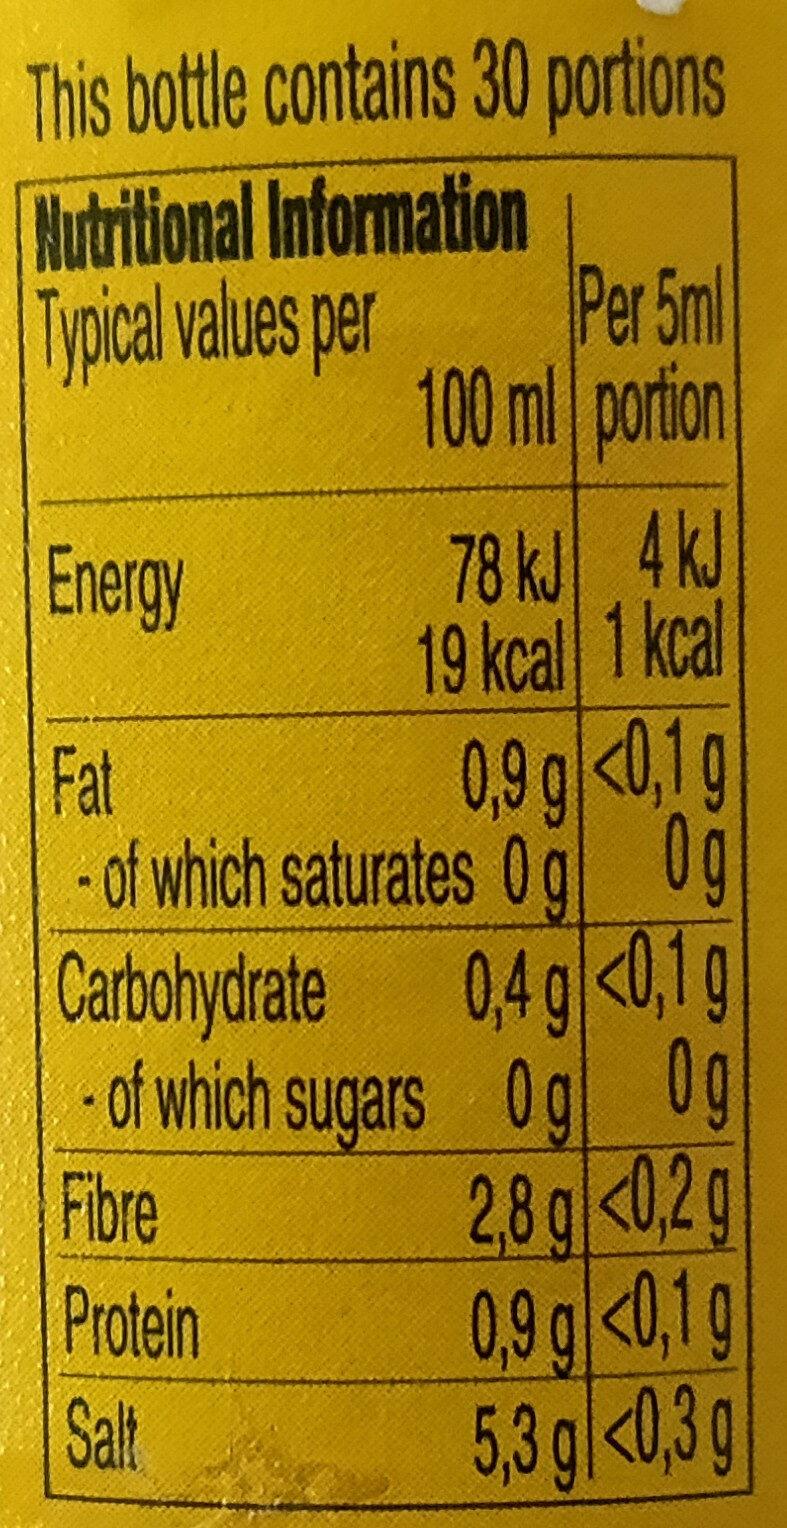 Cholula Hot Sauce Original - Nutrition facts